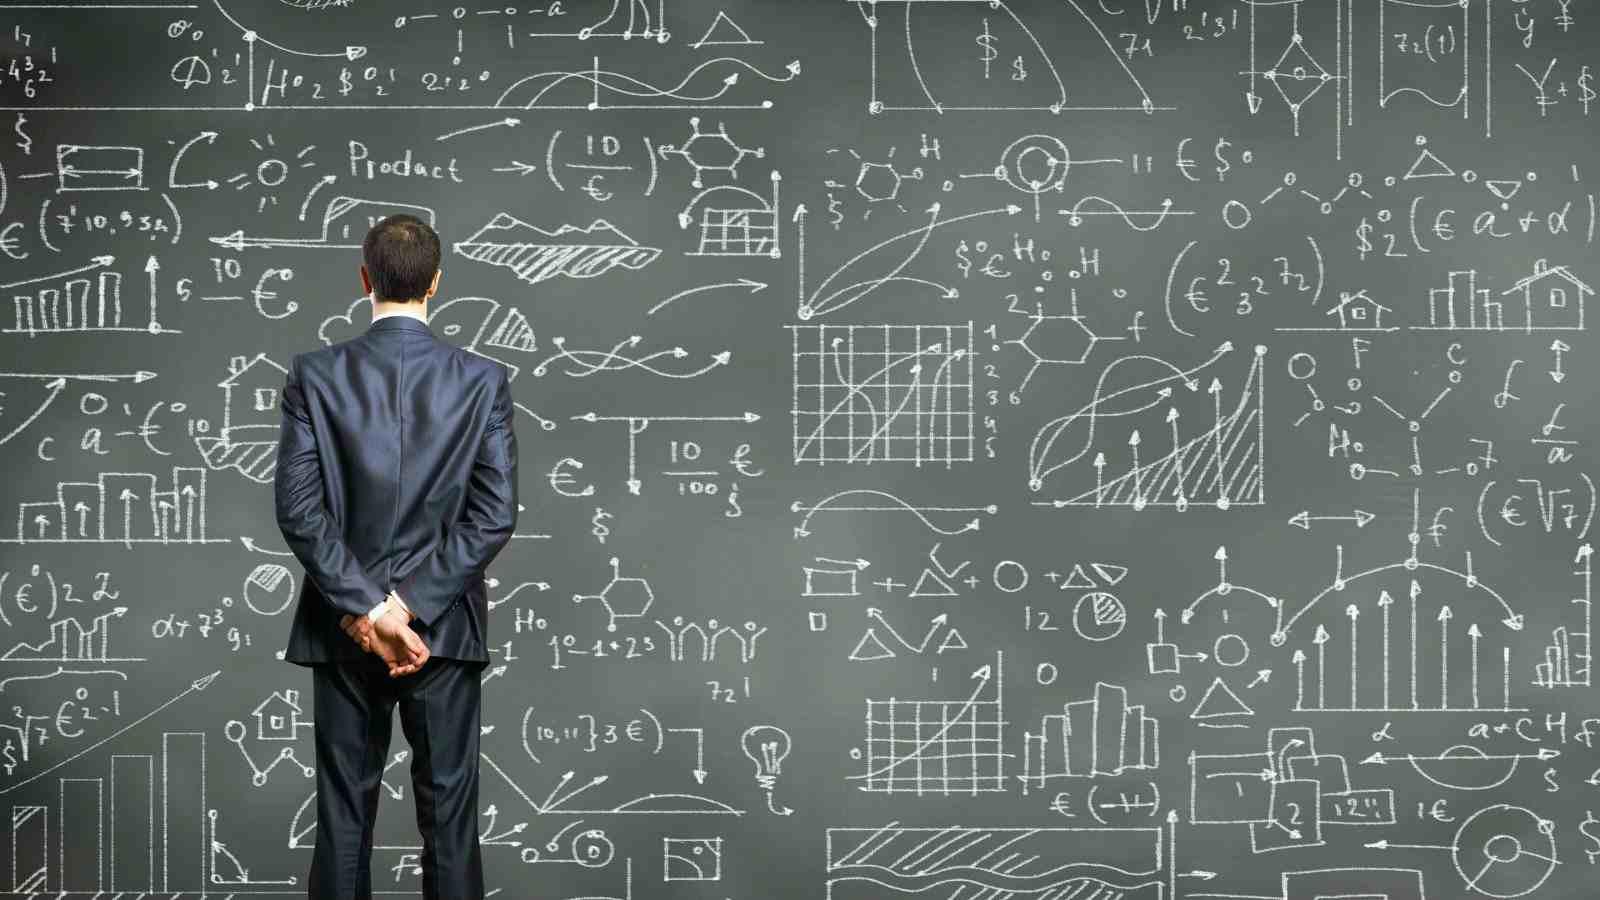 SmartBrains-Data-Science-Full-Stack-Python-Machine-Learning-Programming-Software-development-Web-Development-winter-Summer-Training-Noida-Chennai-Pune-Mumbai-Dehradun (2)